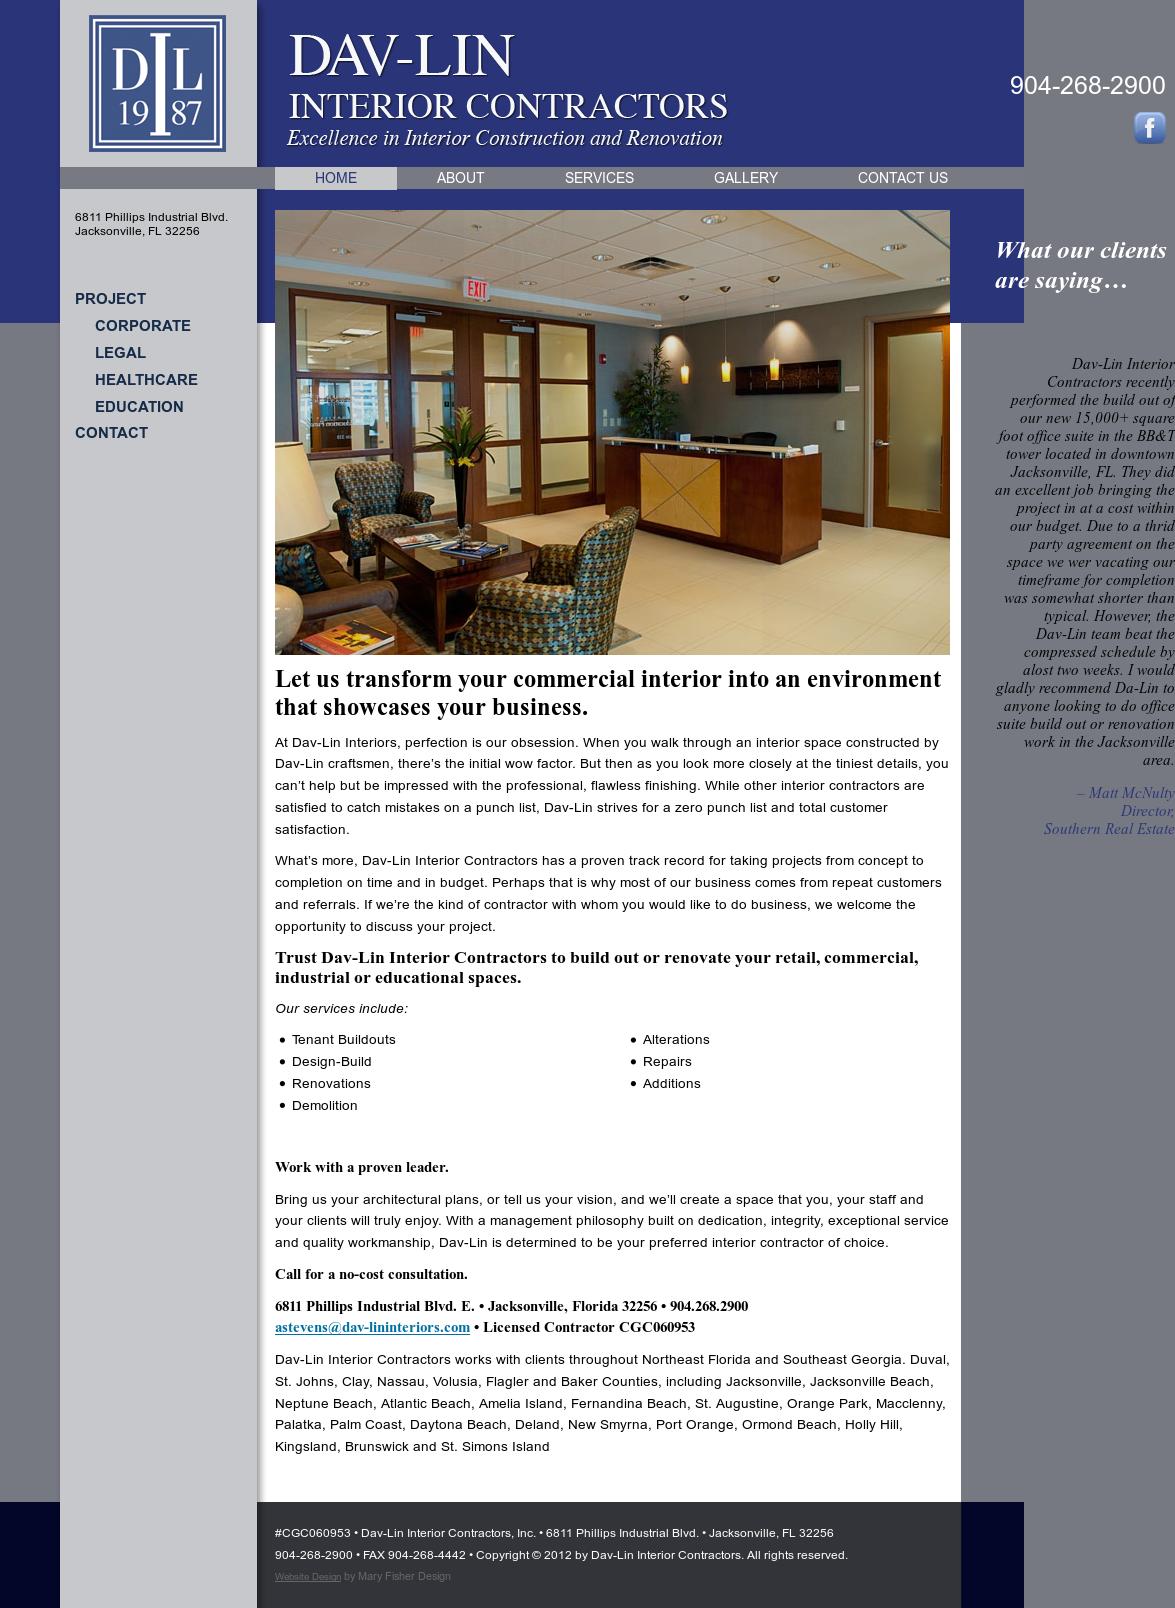 Dav lin interior contractors competitors revenue and for Interior contractors